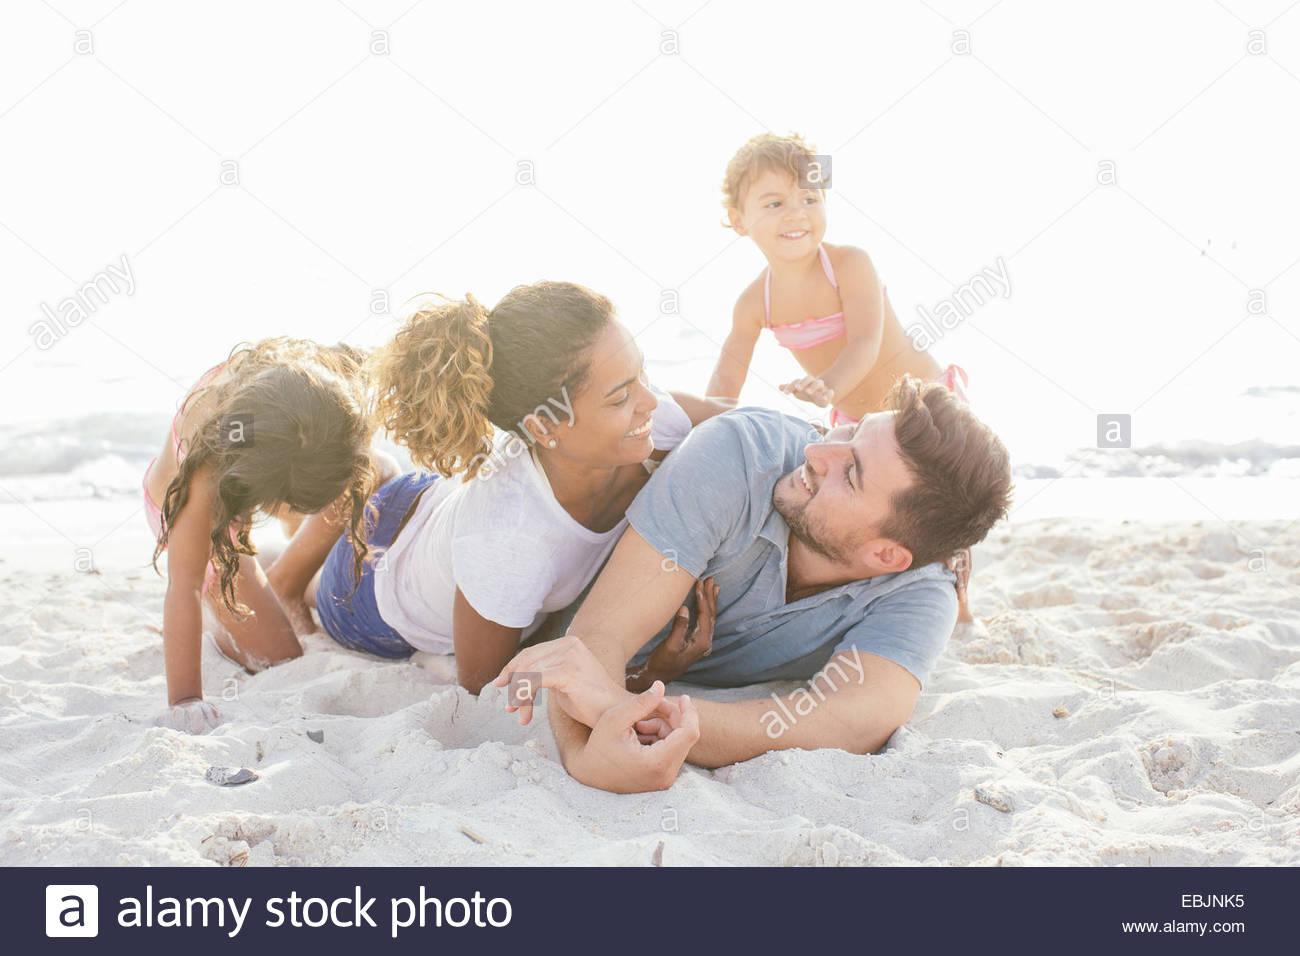 Couple avec deux filles jouent fighting on beach, Toscane, Italie Photo Stock